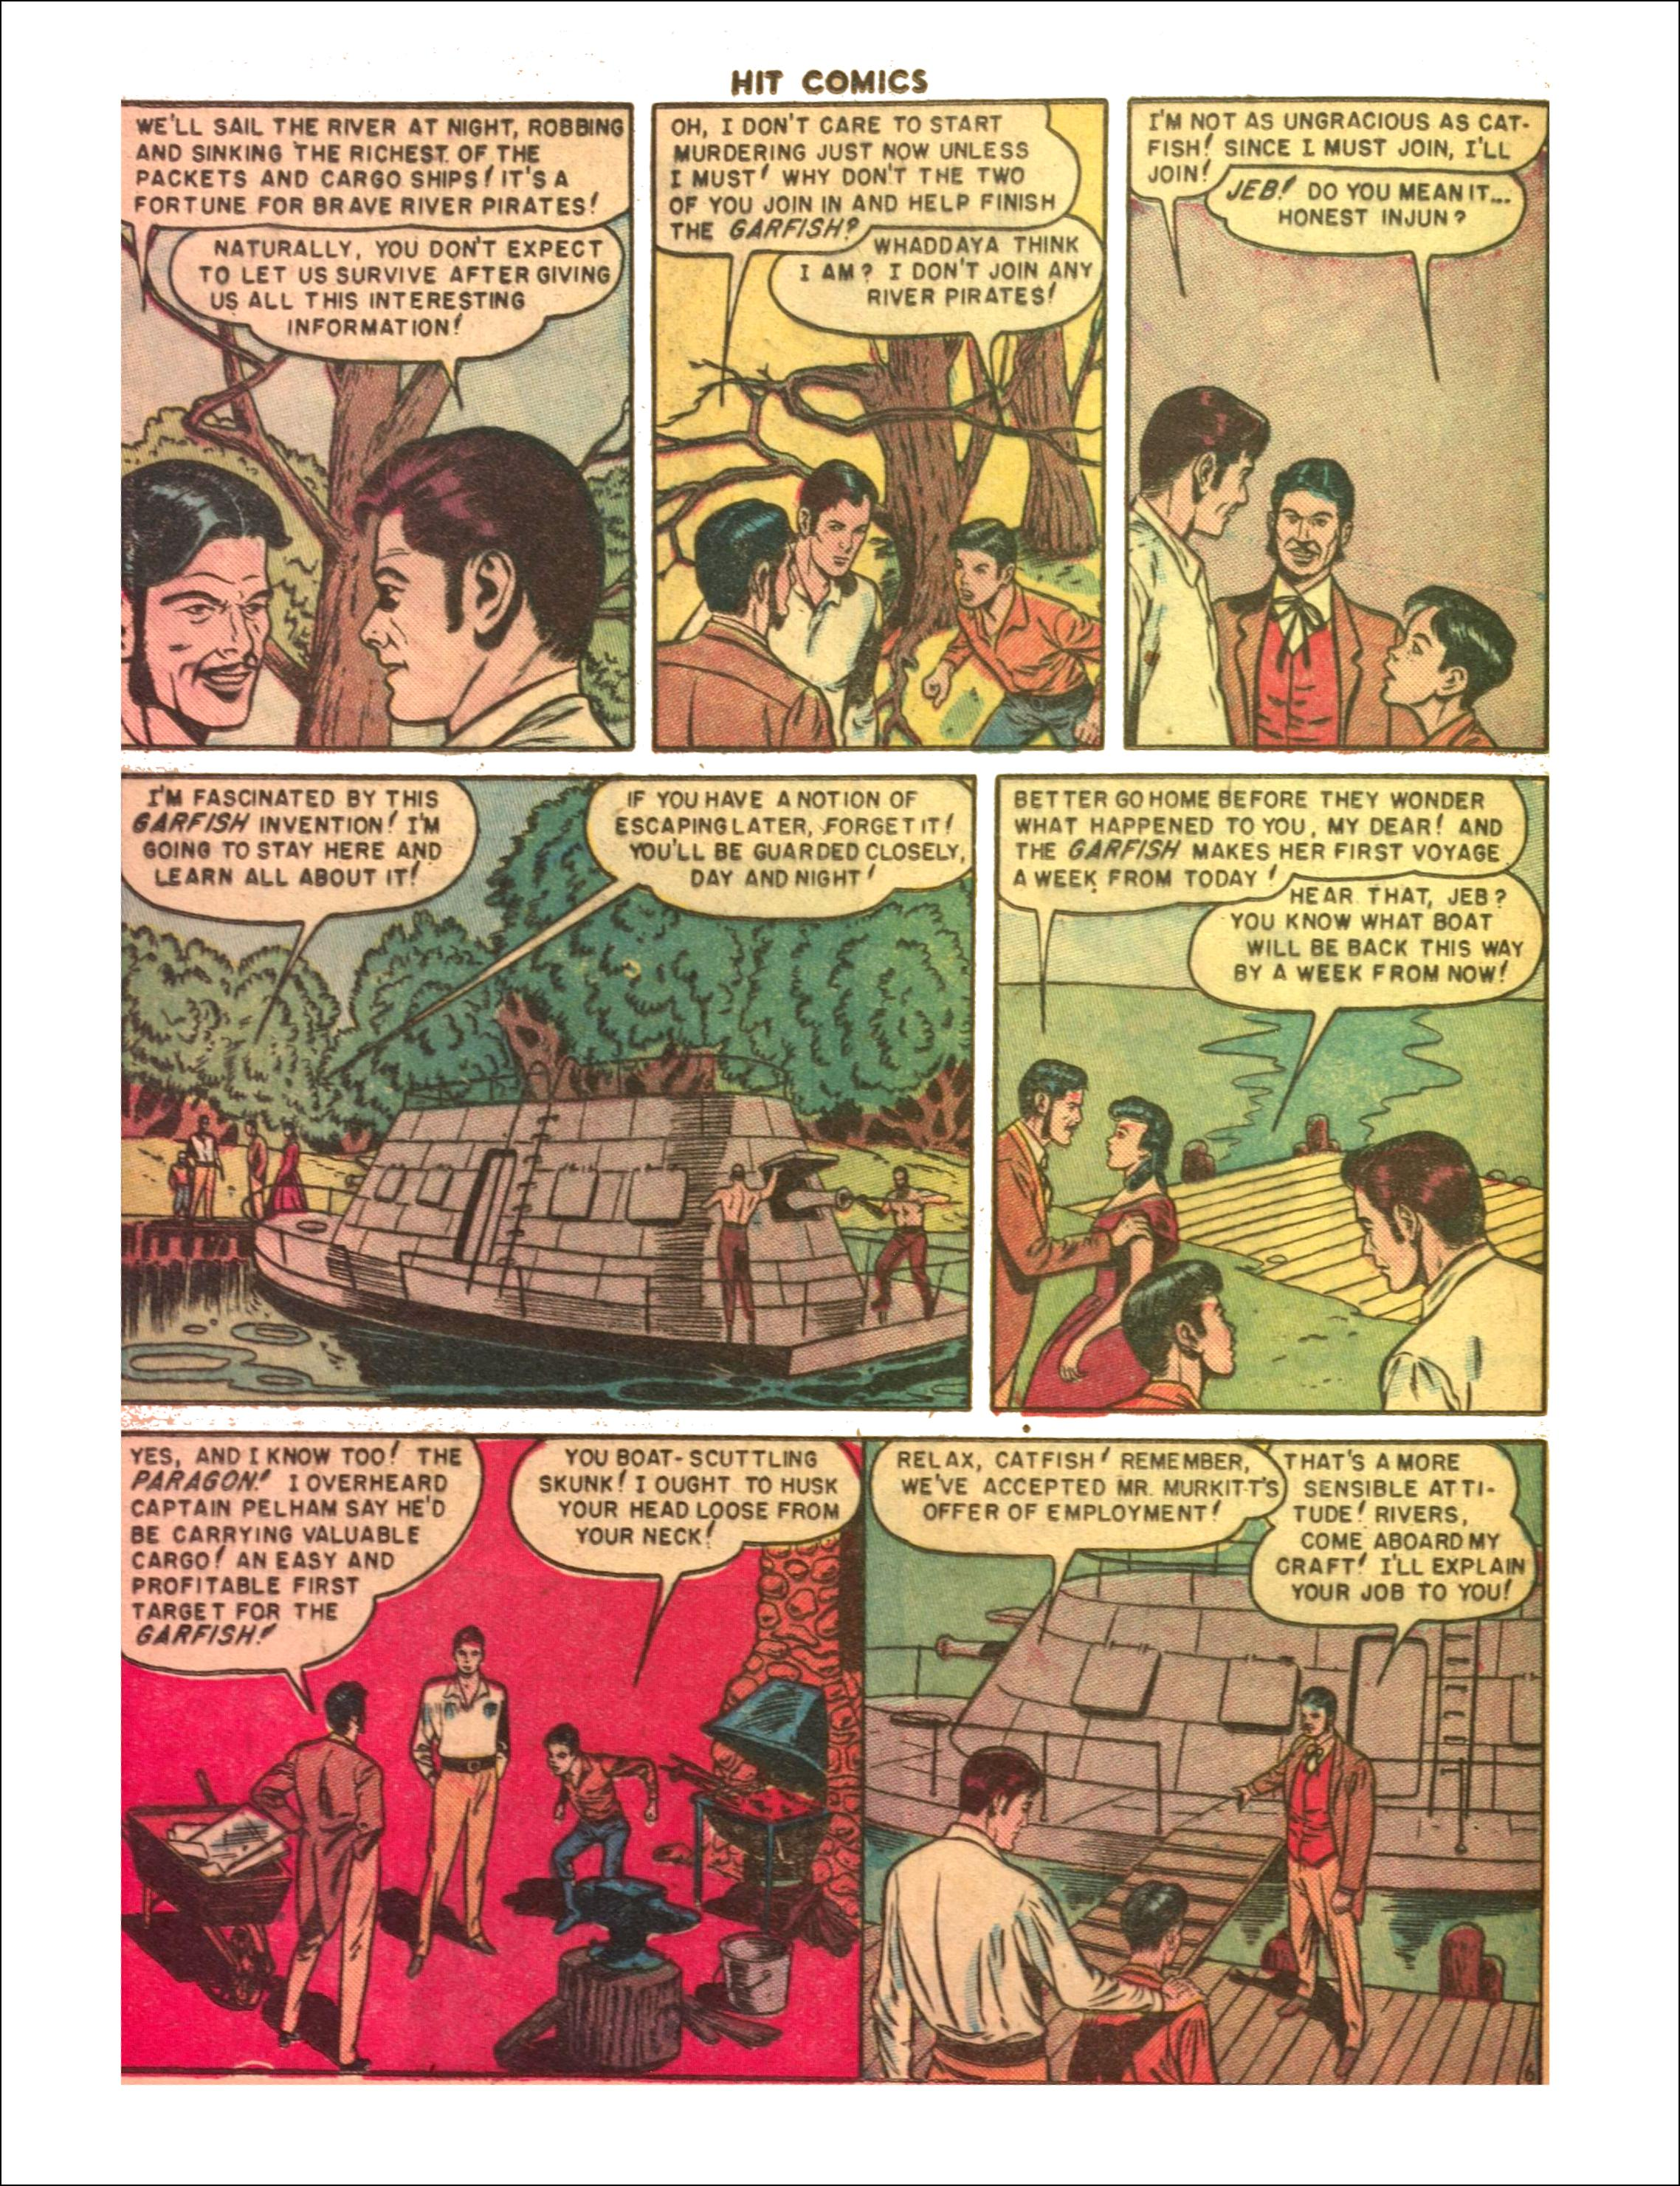 Read online Hit Comics comic -  Issue #65 - 8